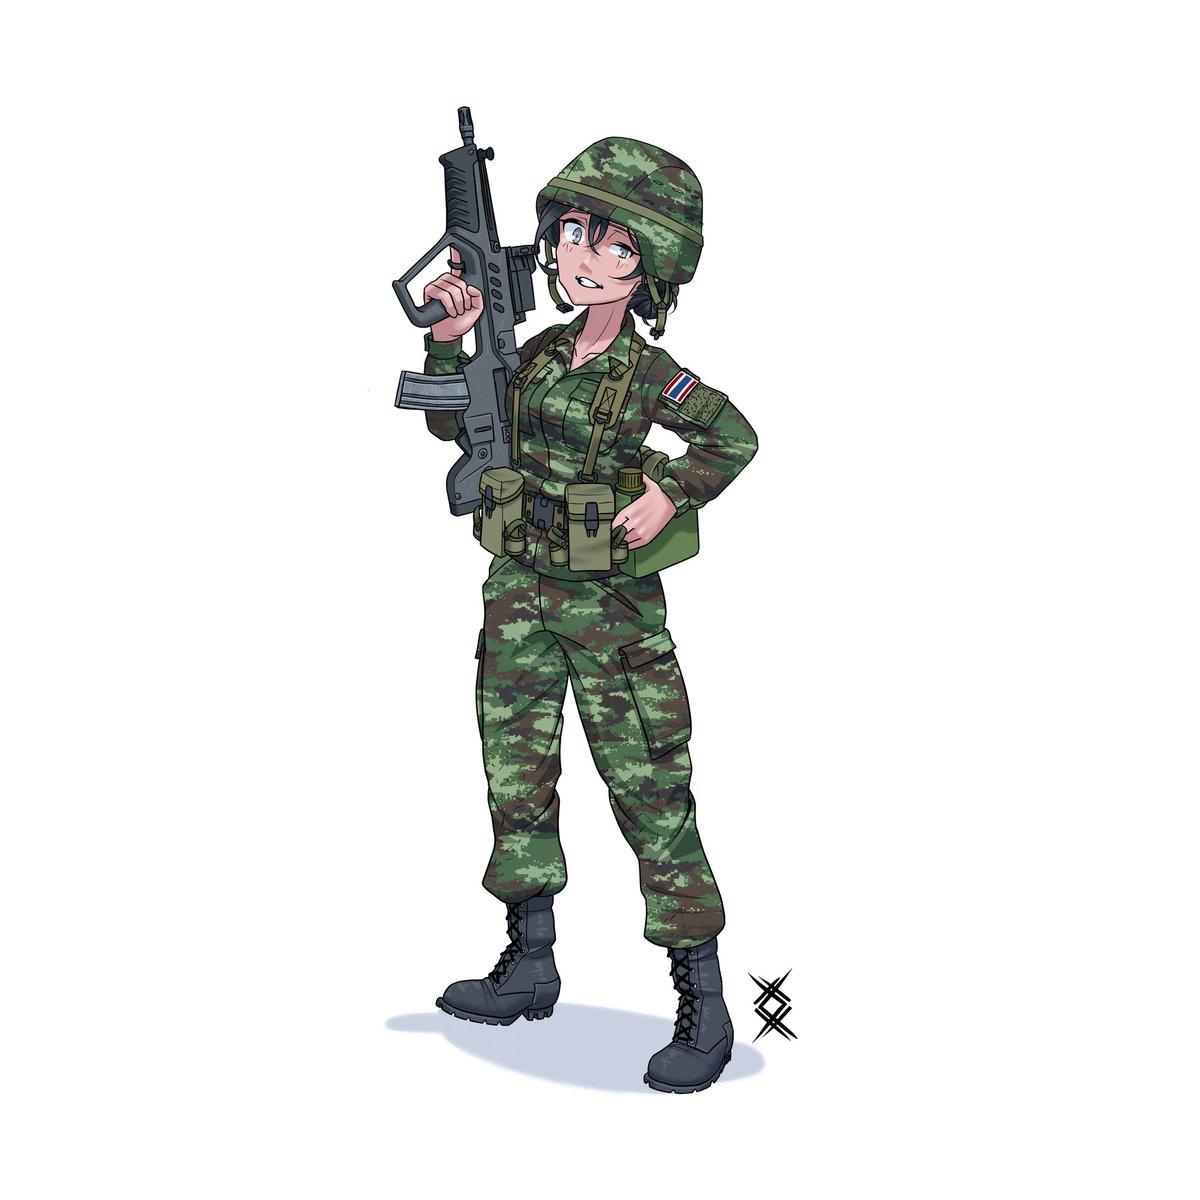 Thai army girl, commission for @Distant_Witness   #thailand #tar21 #camouflage #animegirl #art #commissionartpic.twitter.com/YdHMS6I47b